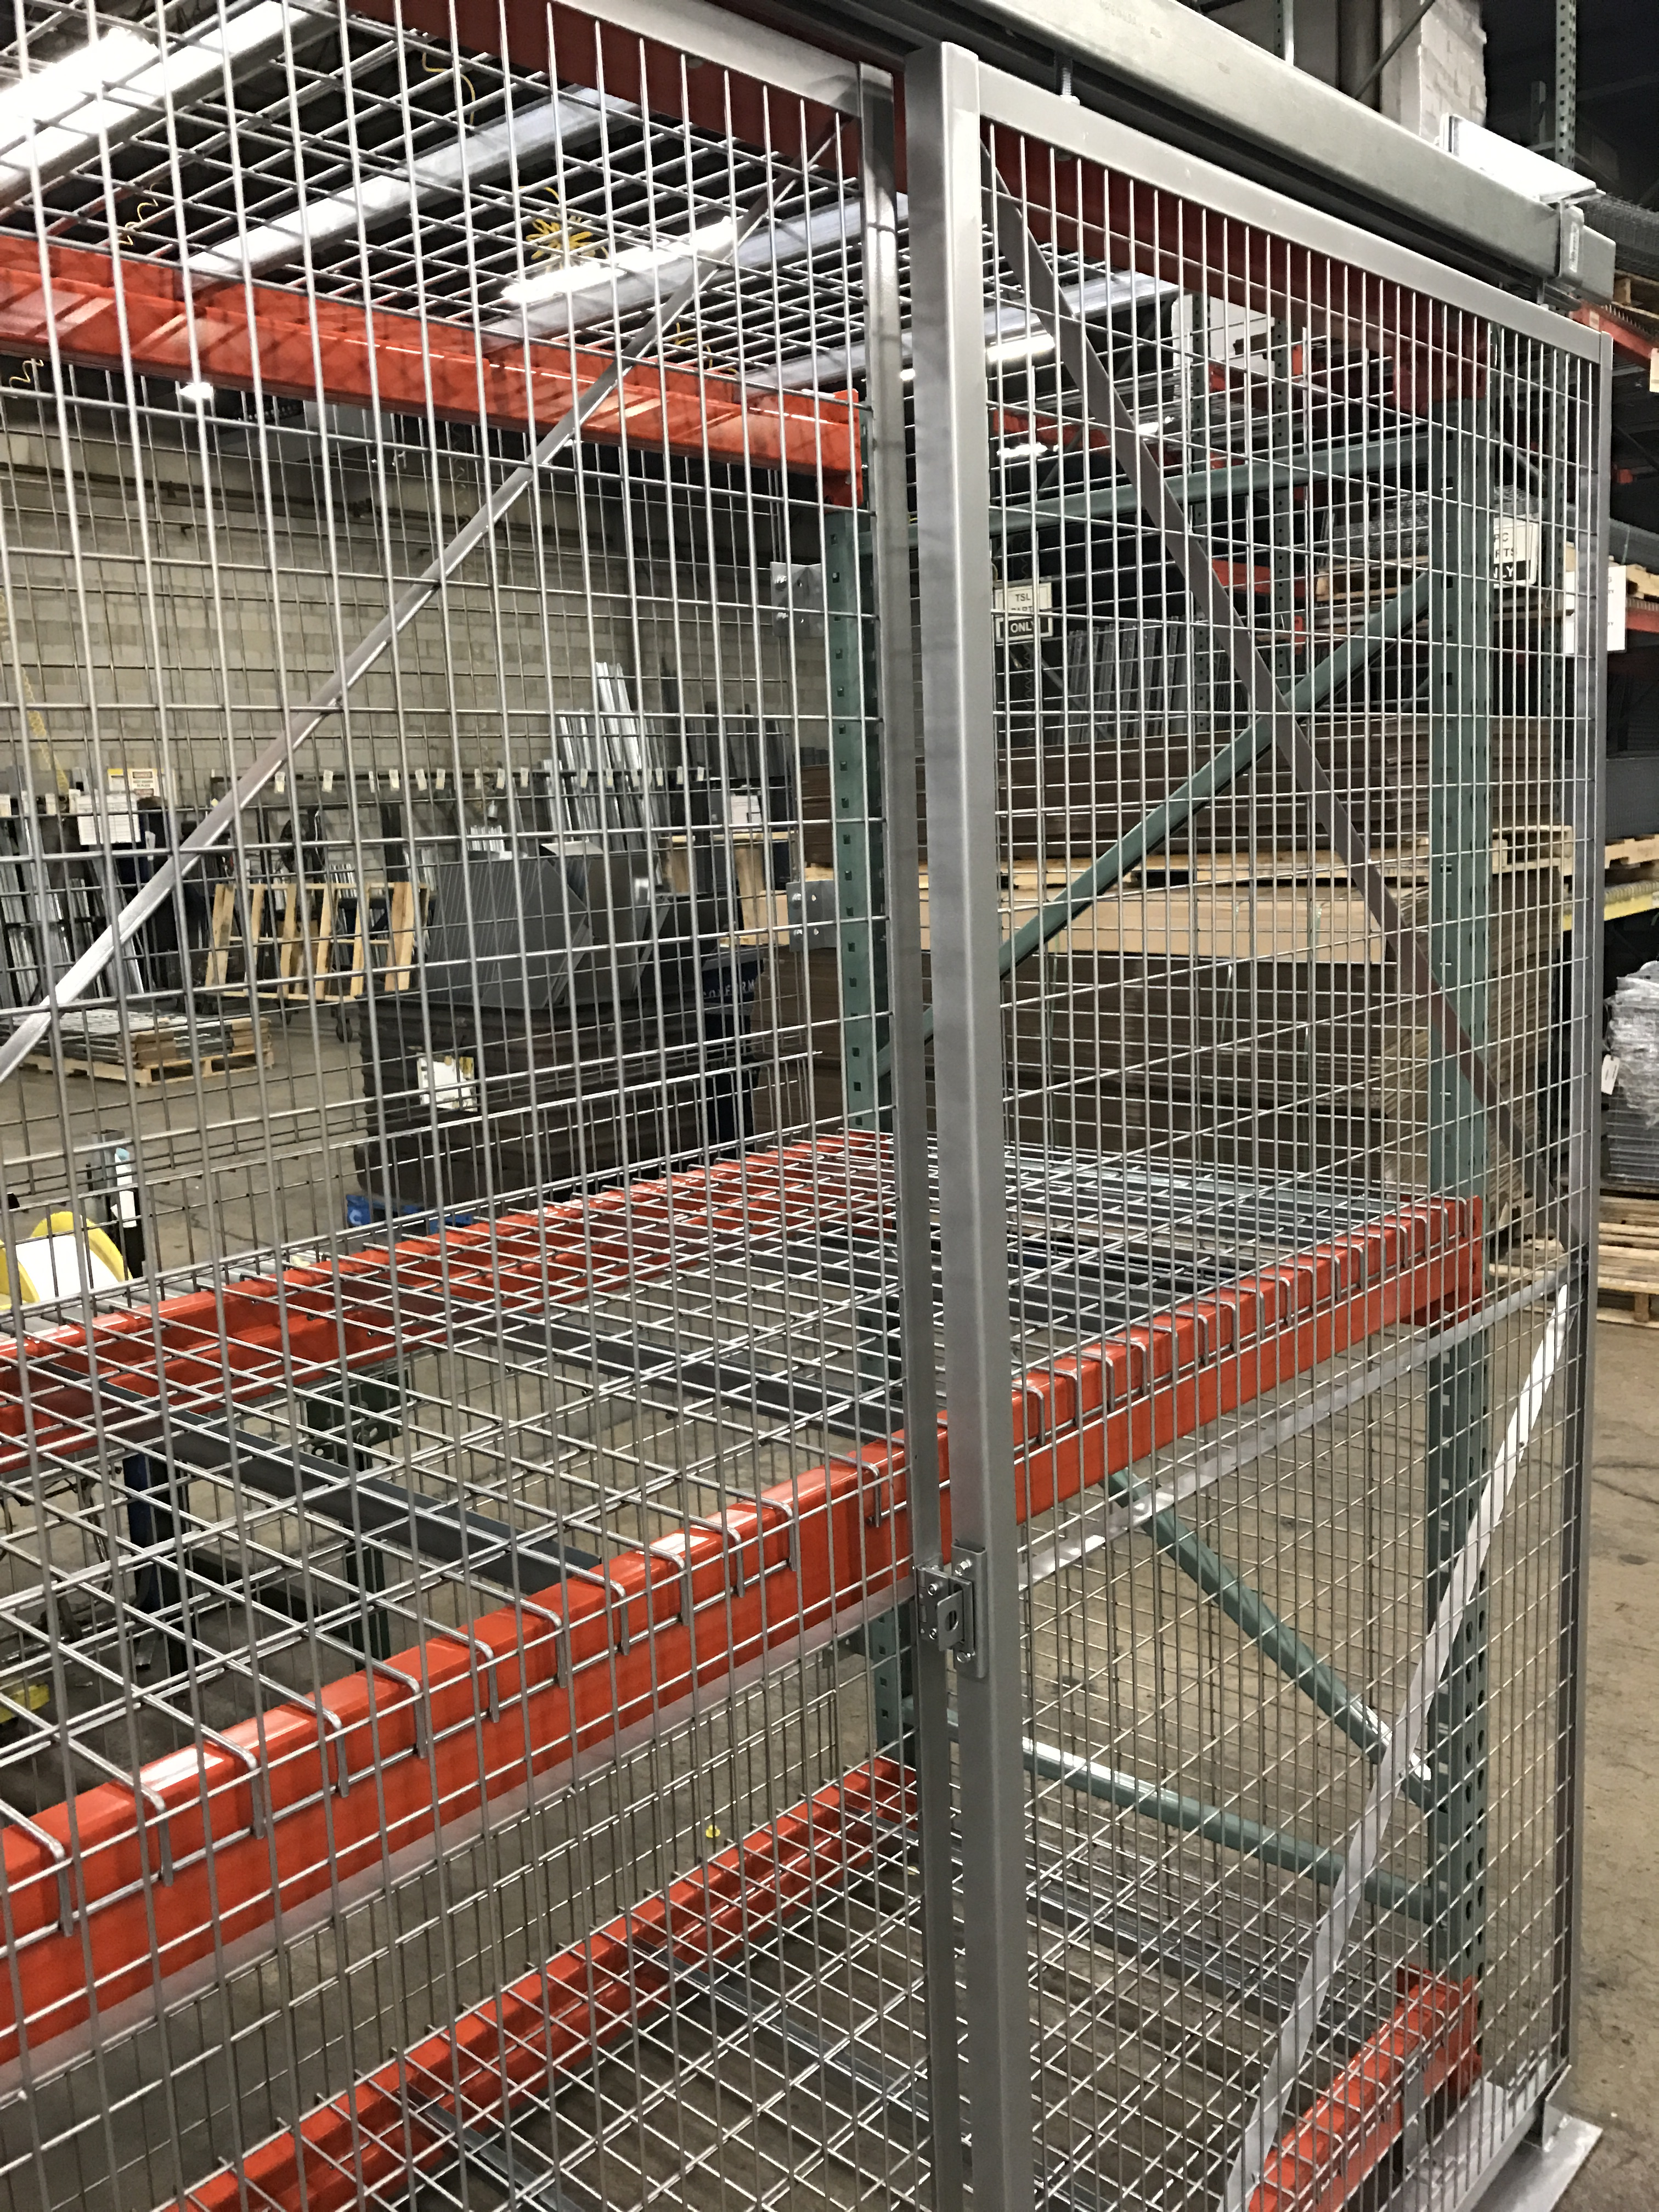 Pallet Rack Enclosure Cages Nj Lockersusa